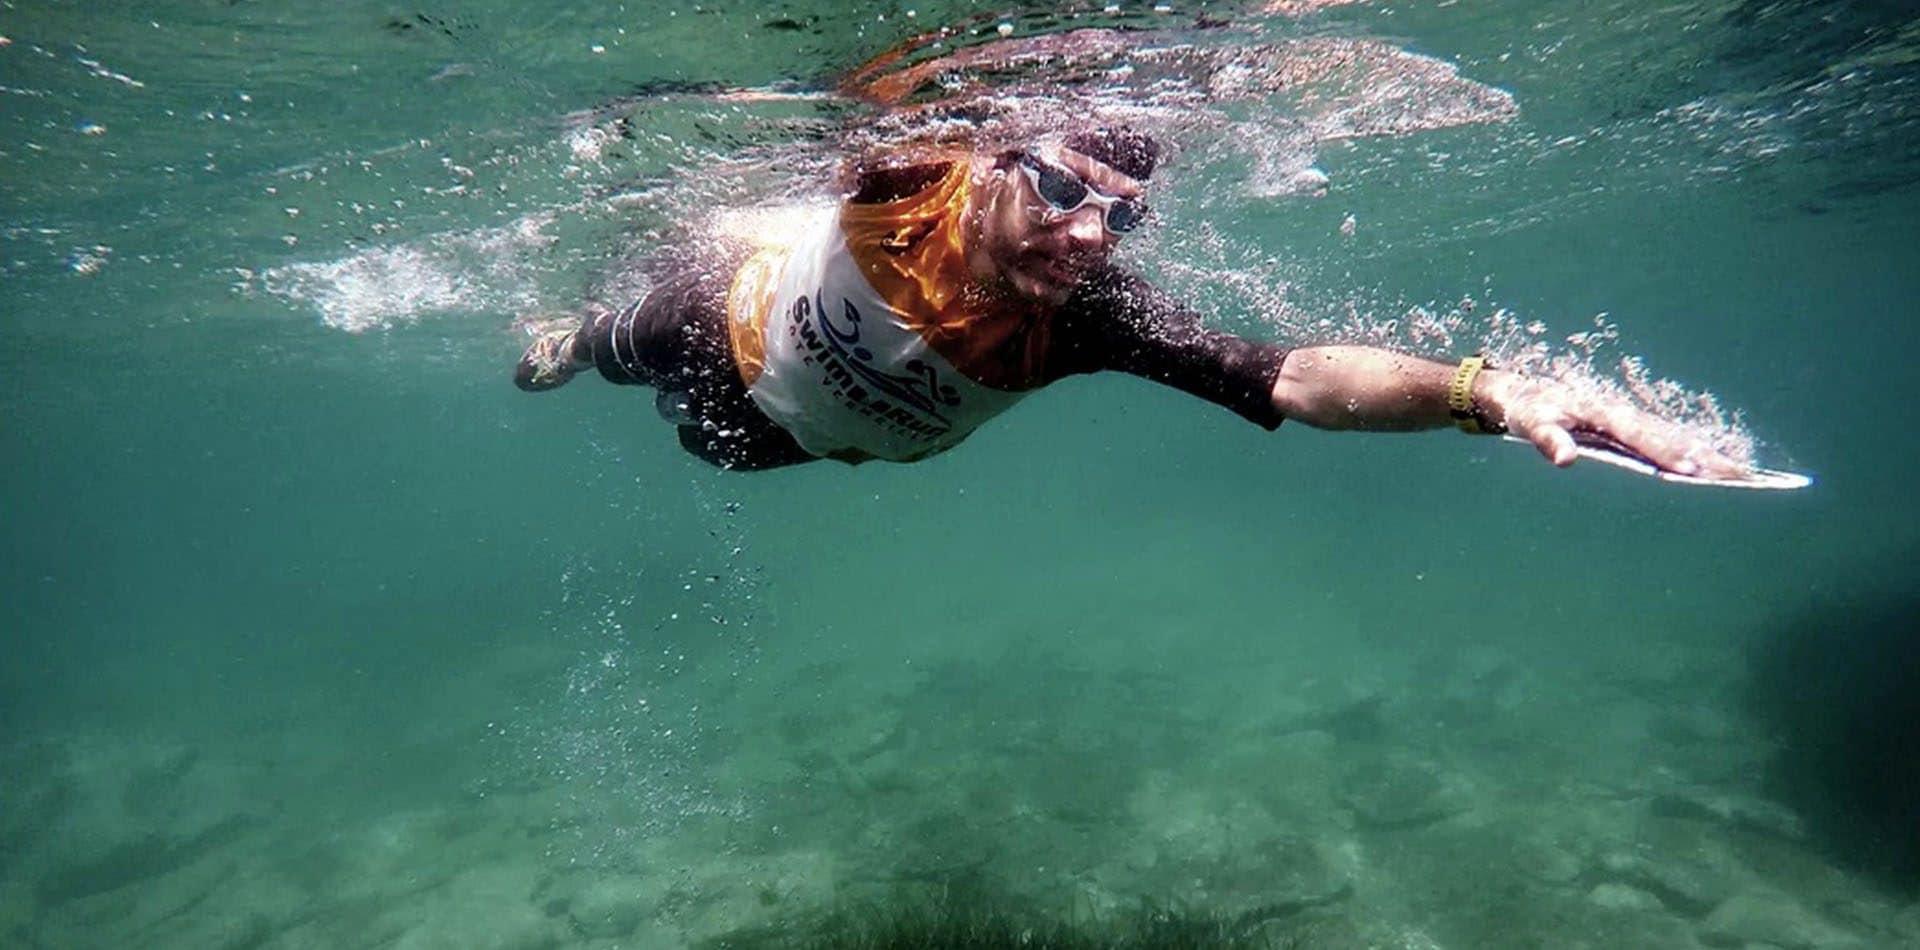 natation homme